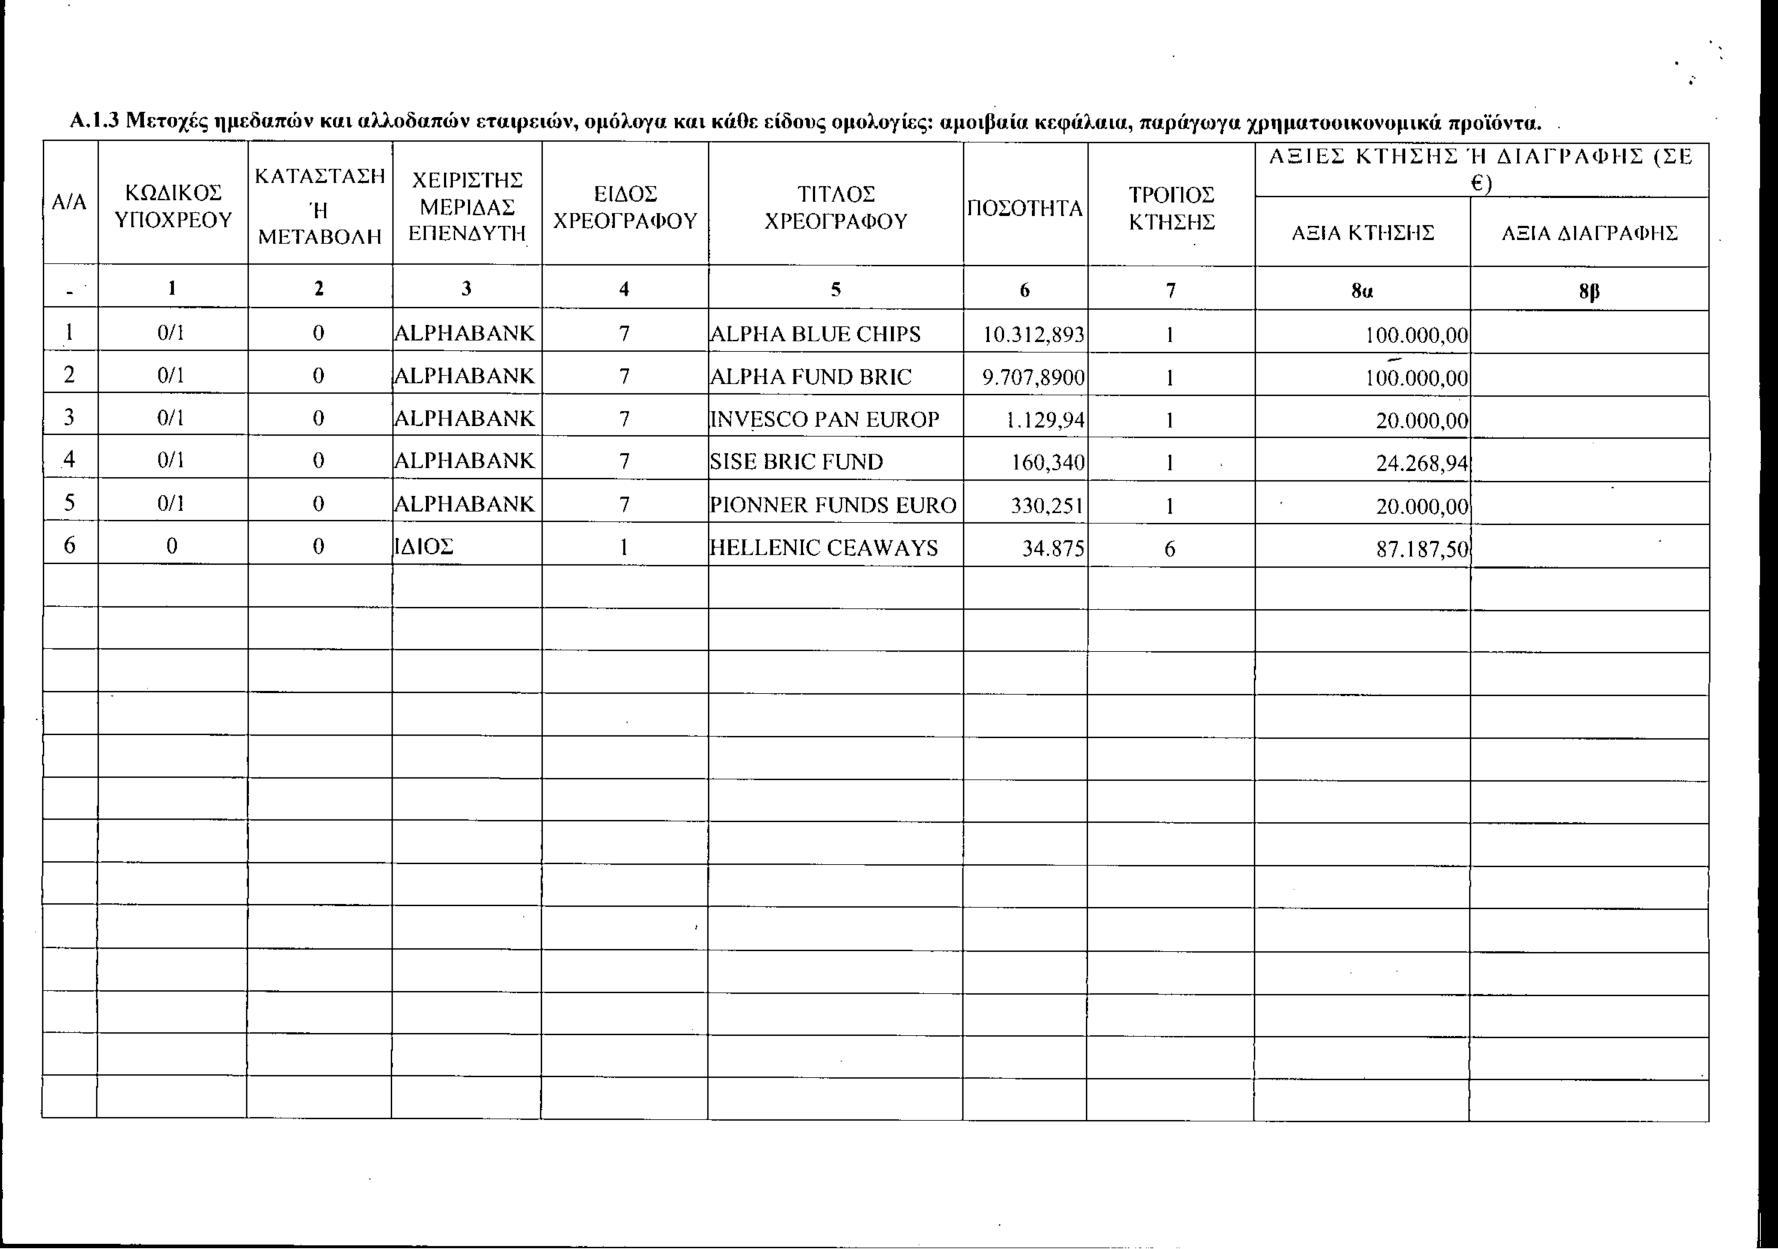 STATHAKIS_GEORGIOS_7523-page-004